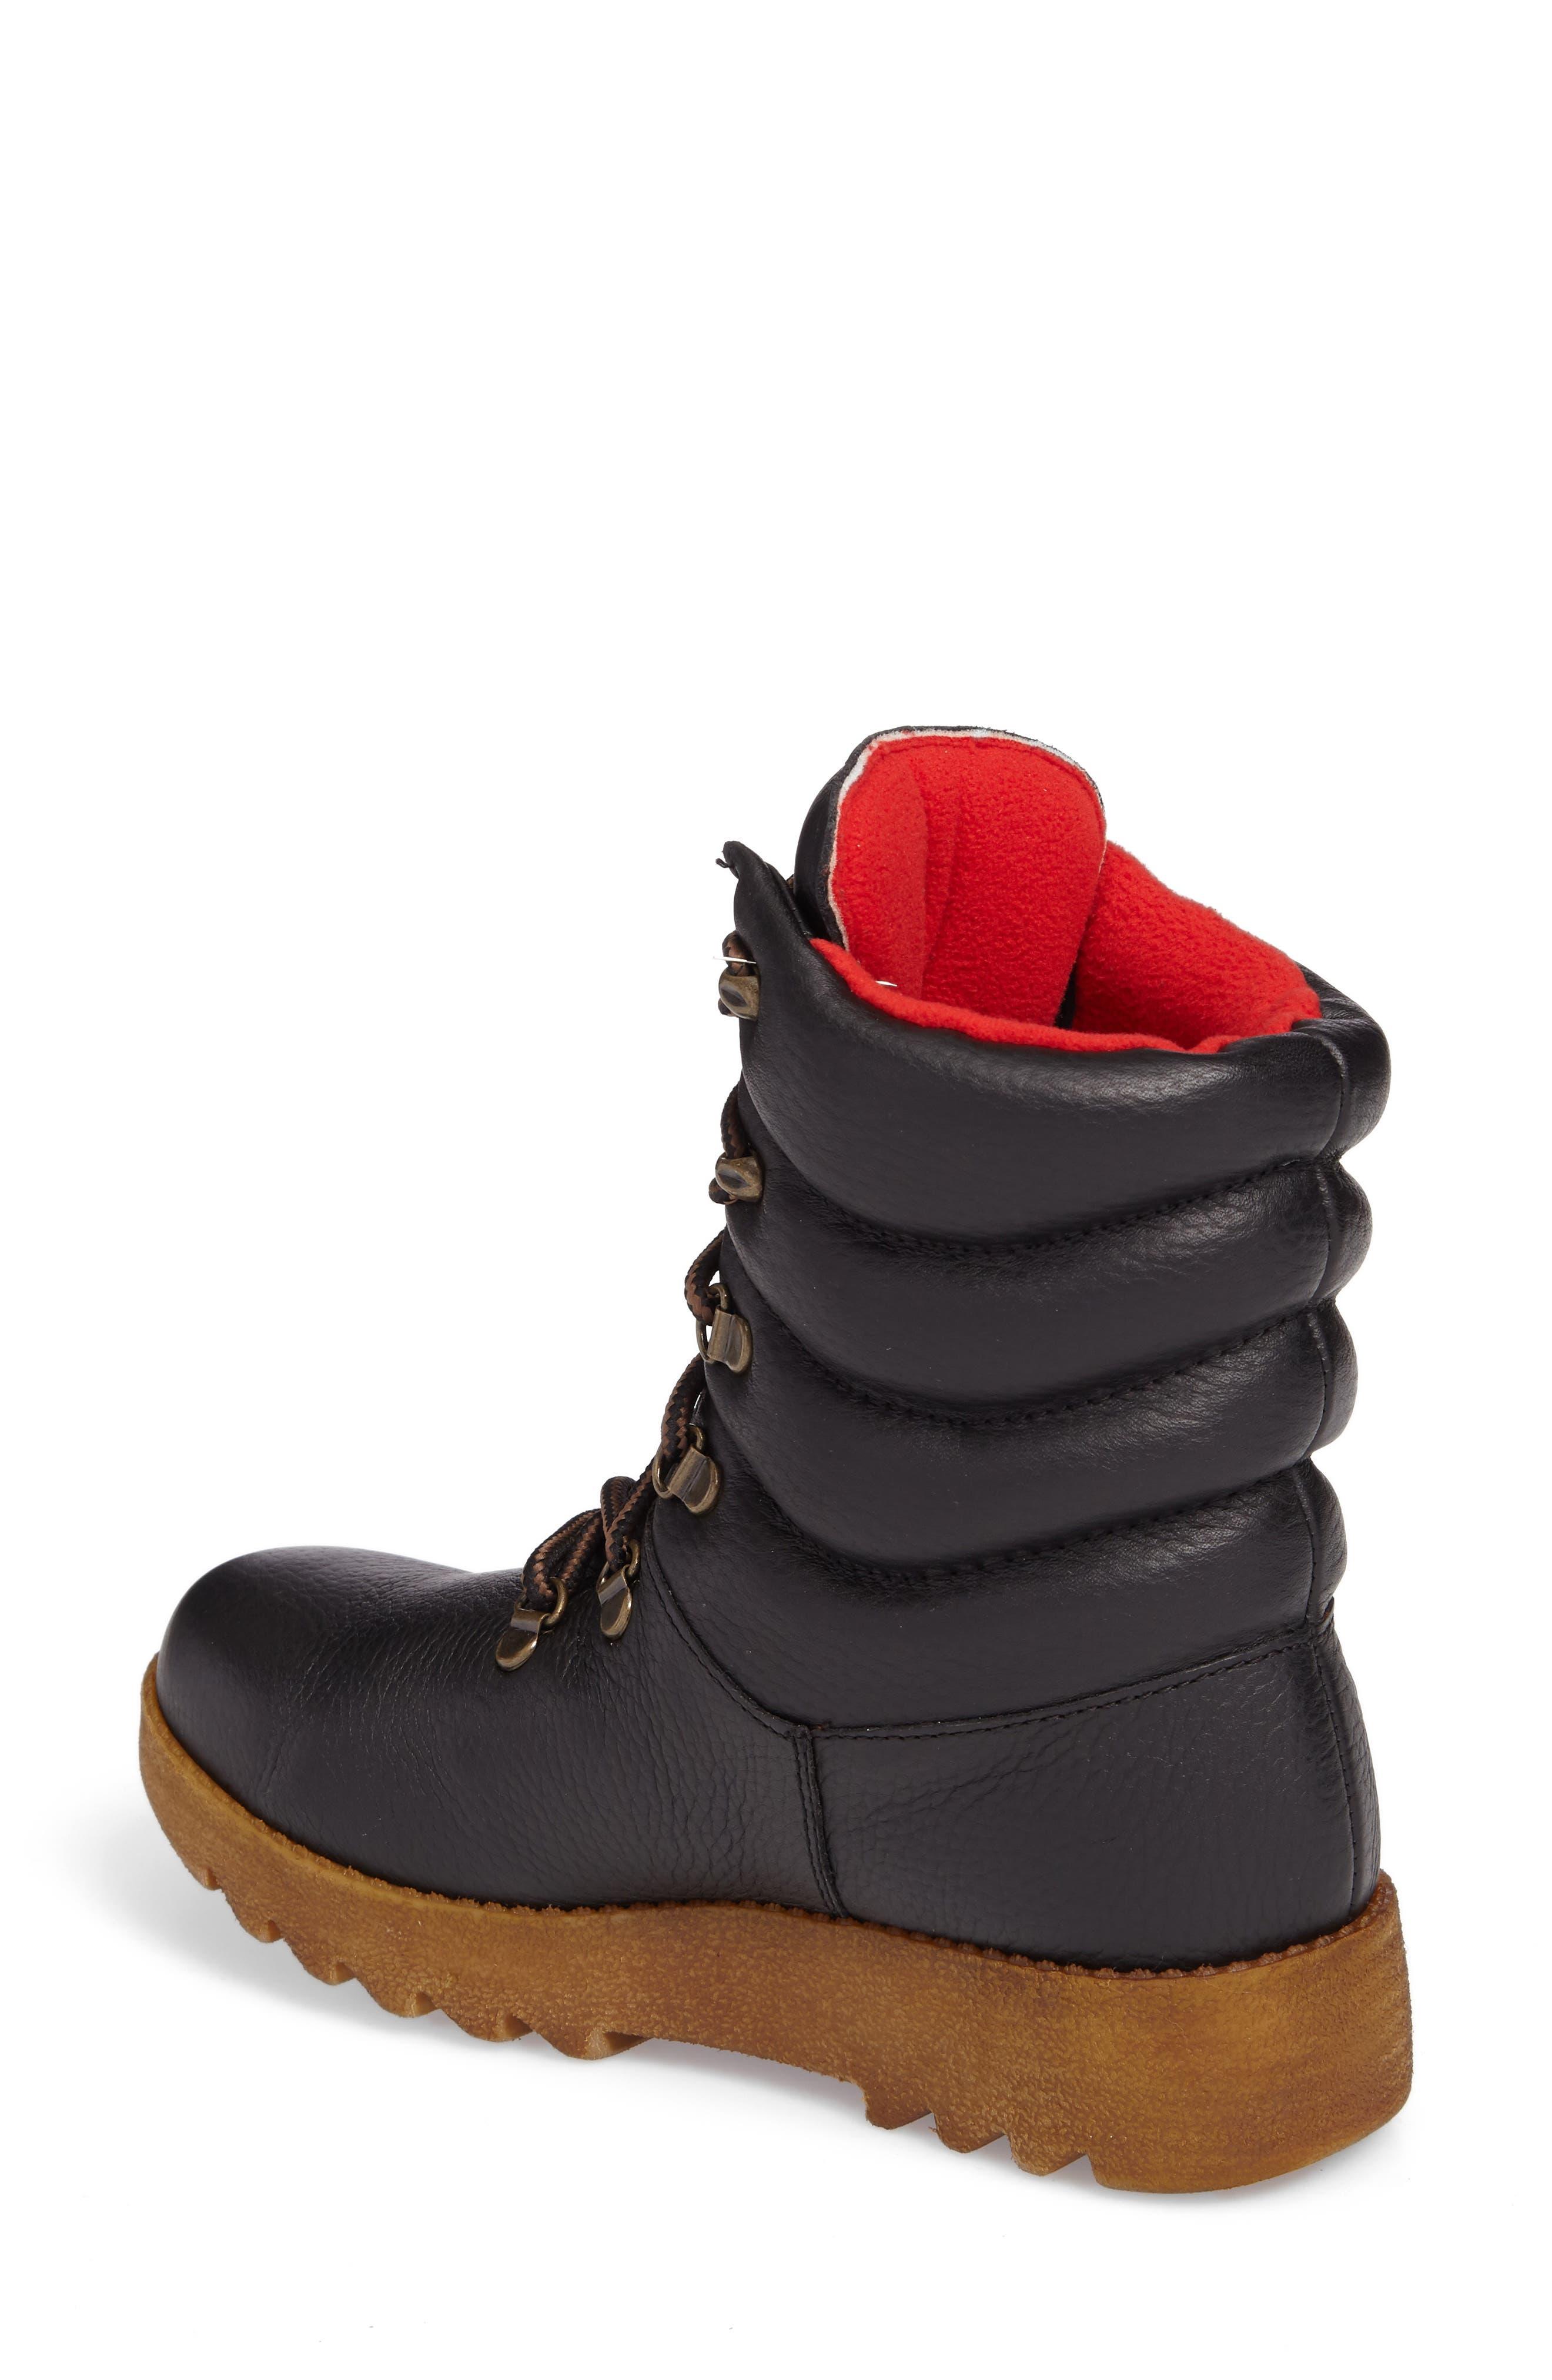 Original Pillow Waterproof Boot,                             Alternate thumbnail 2, color,                             Black Leather